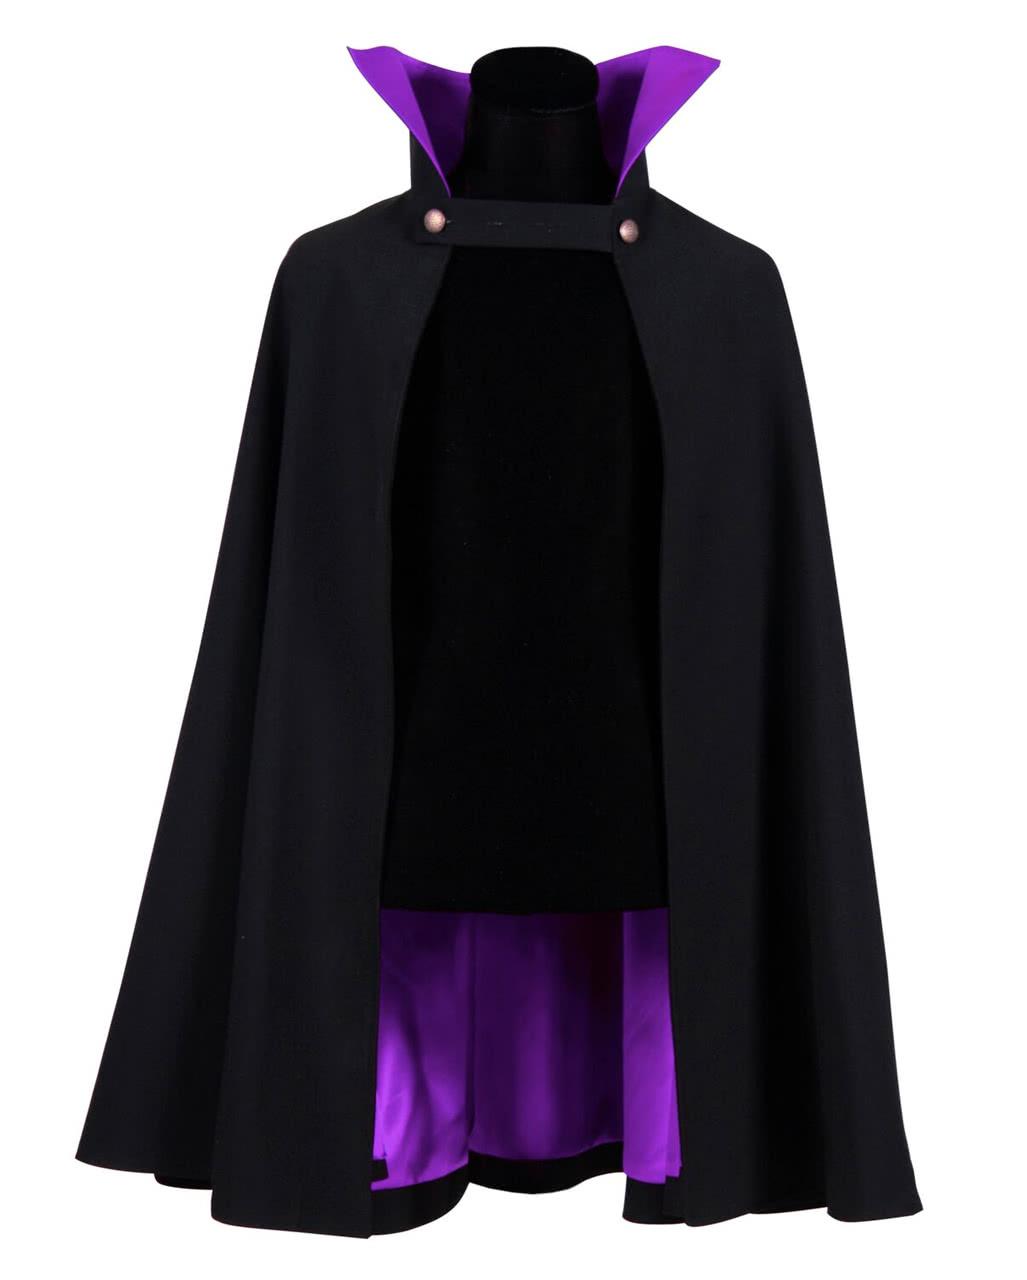 Vampire Cape Deluxe black-purple  0c76471010af6